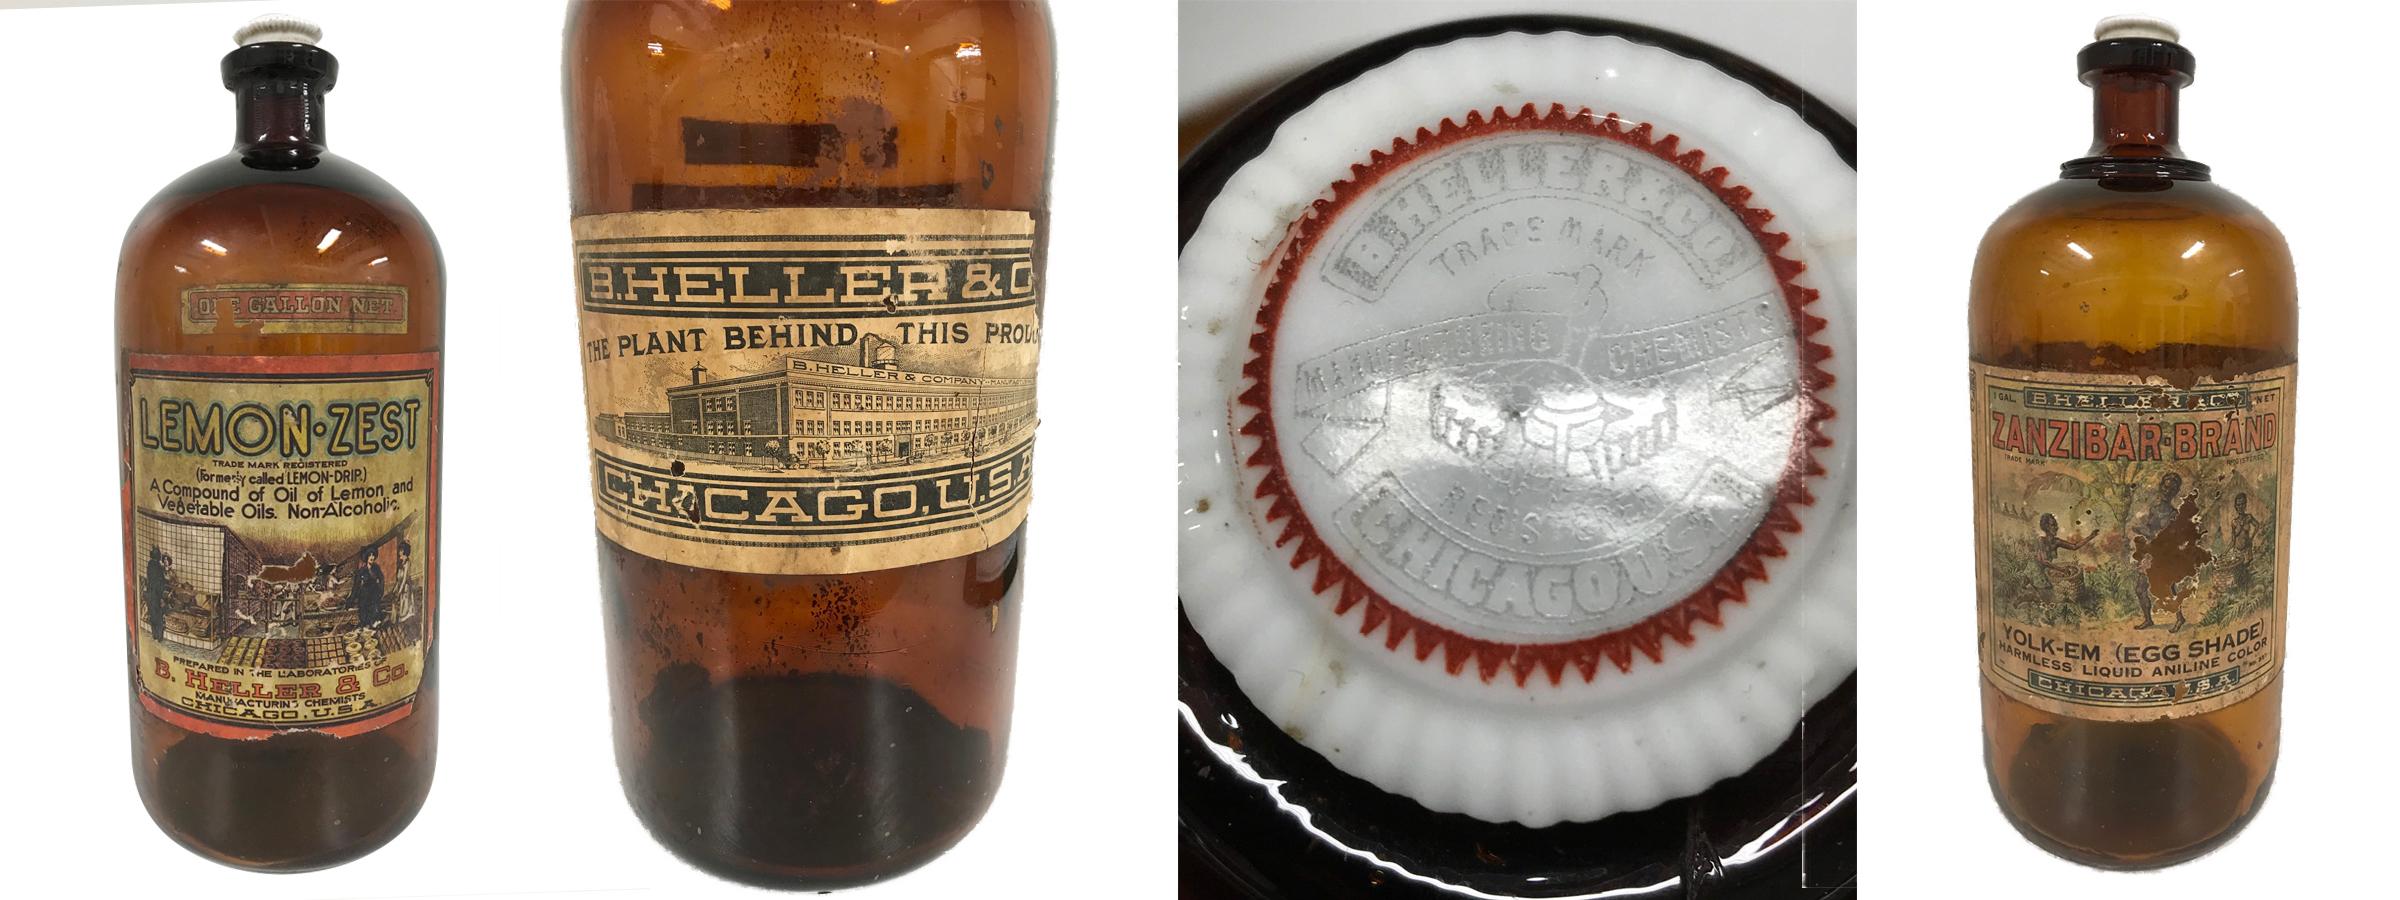 B. Heller and Company: Lemon Zest, back label with image of plant, embossed stopper, and Zanzibar Brand Yolk-Em